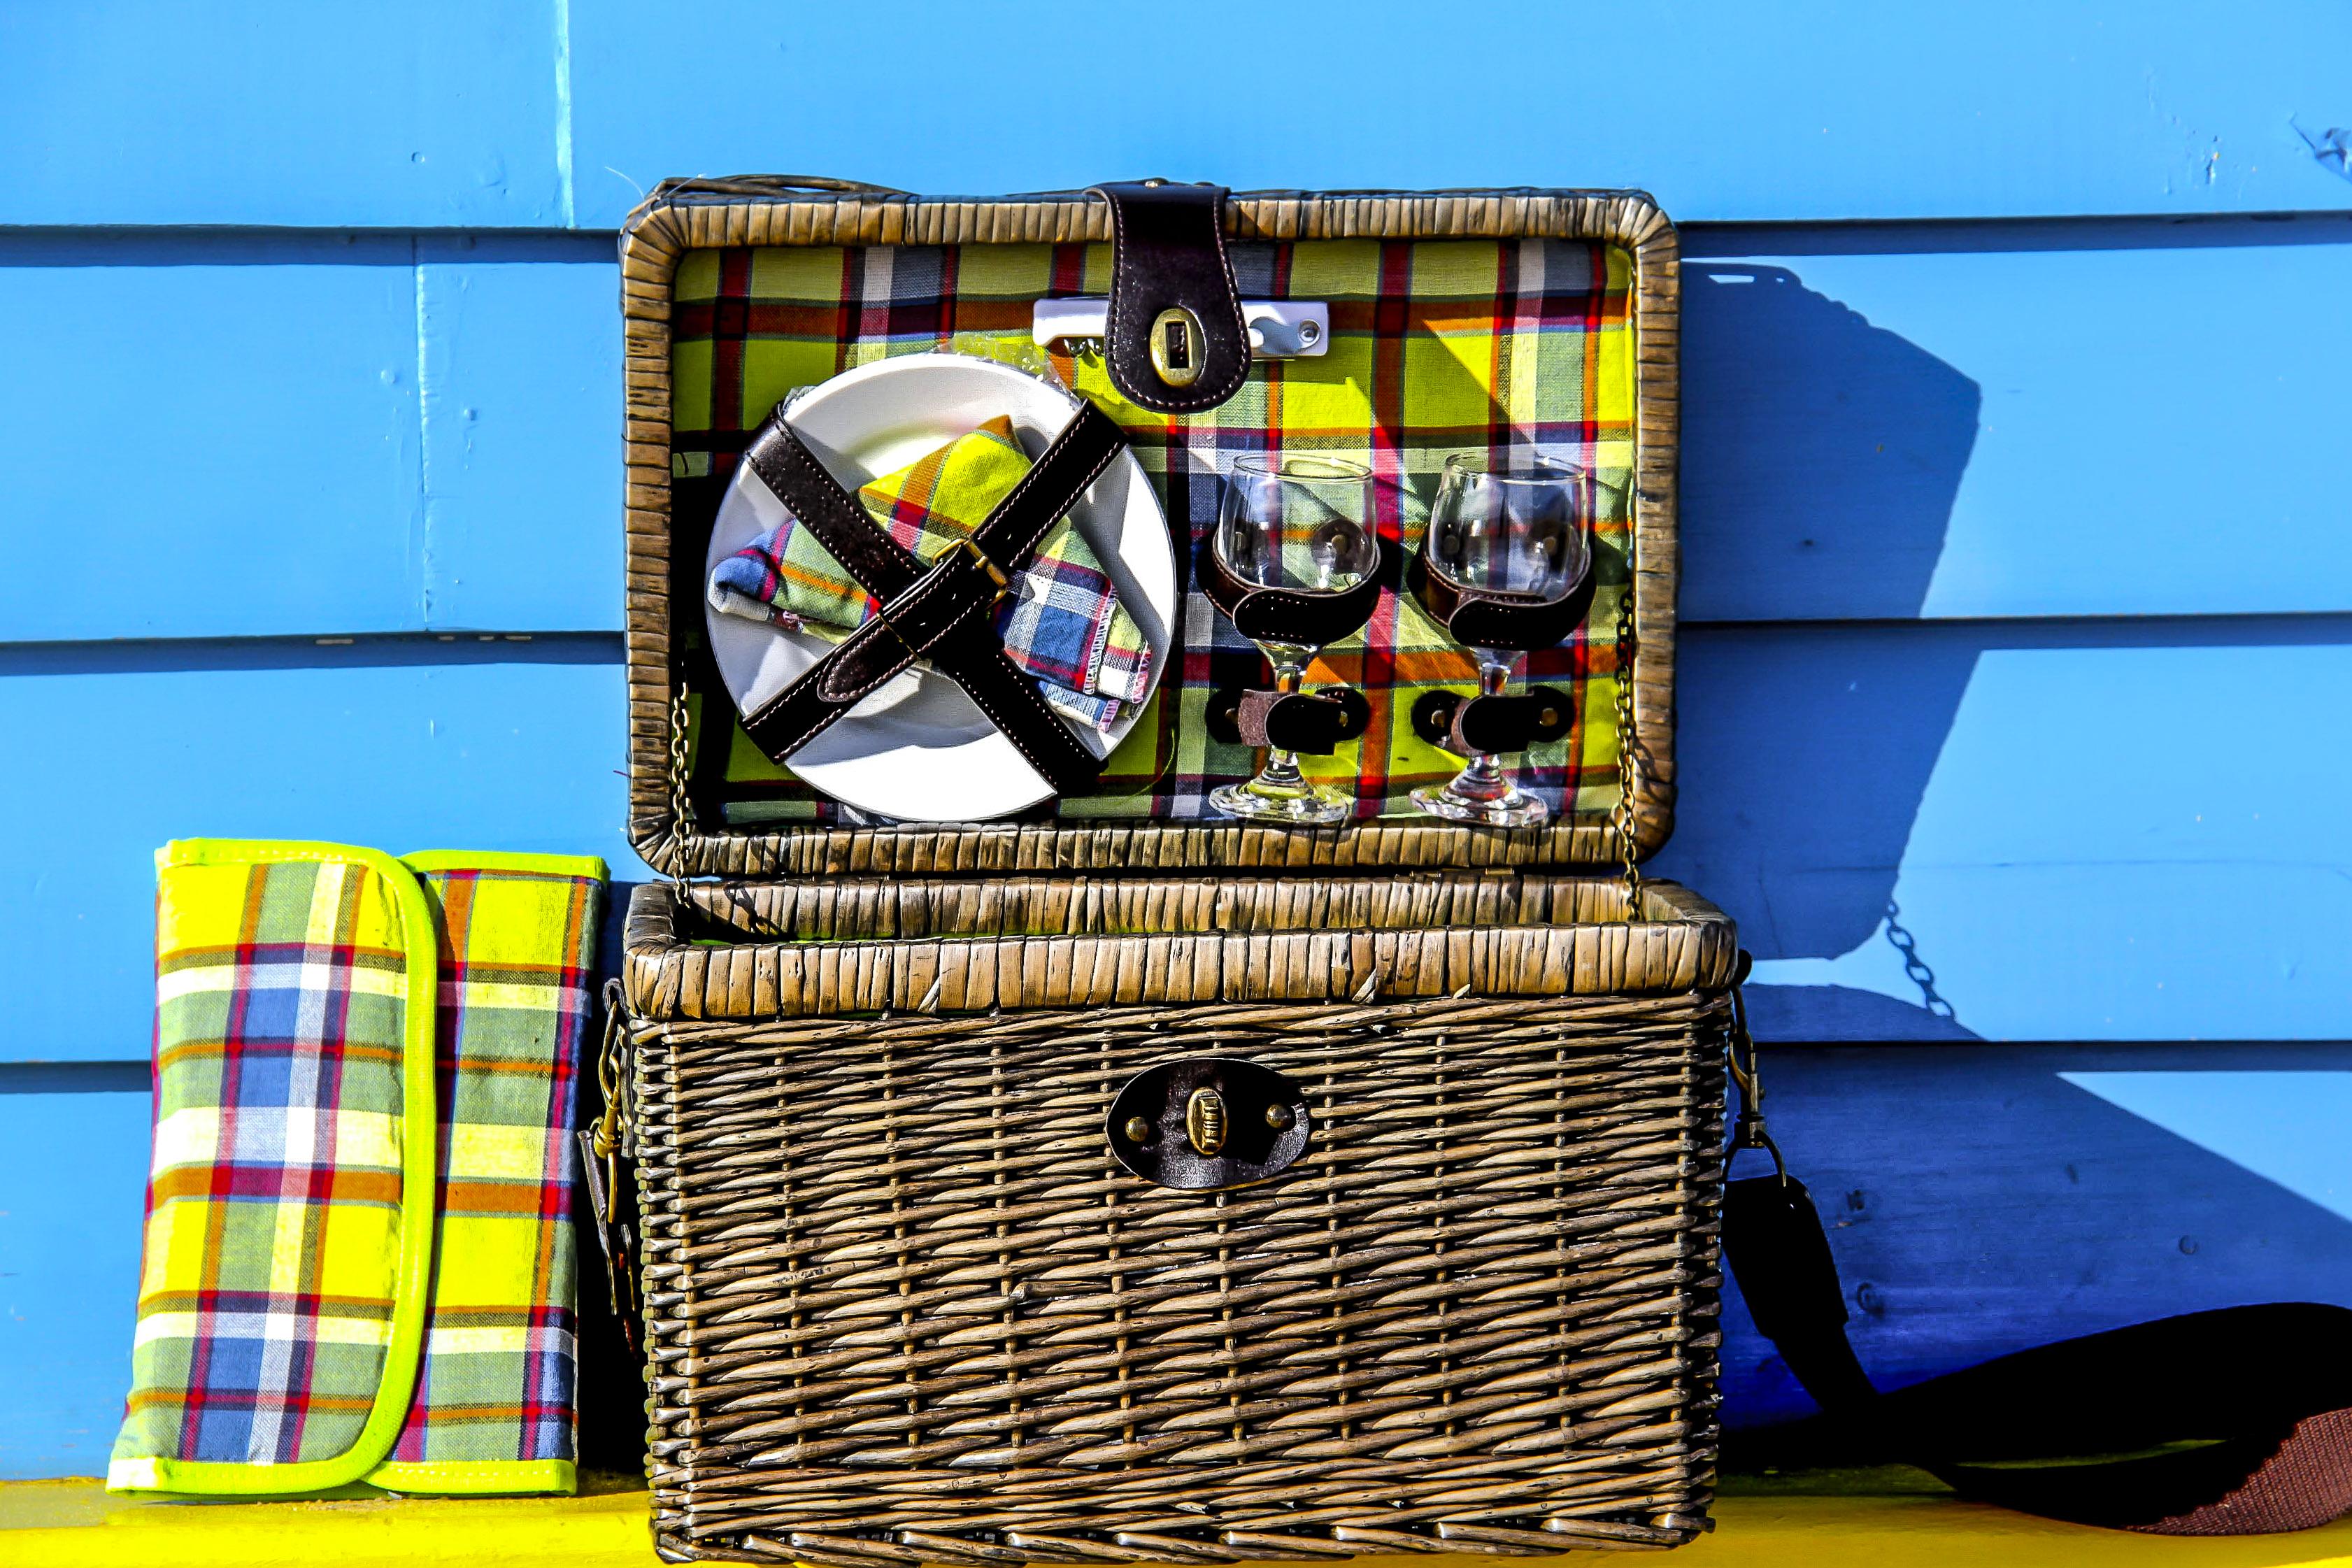 handwoven picnic baskets